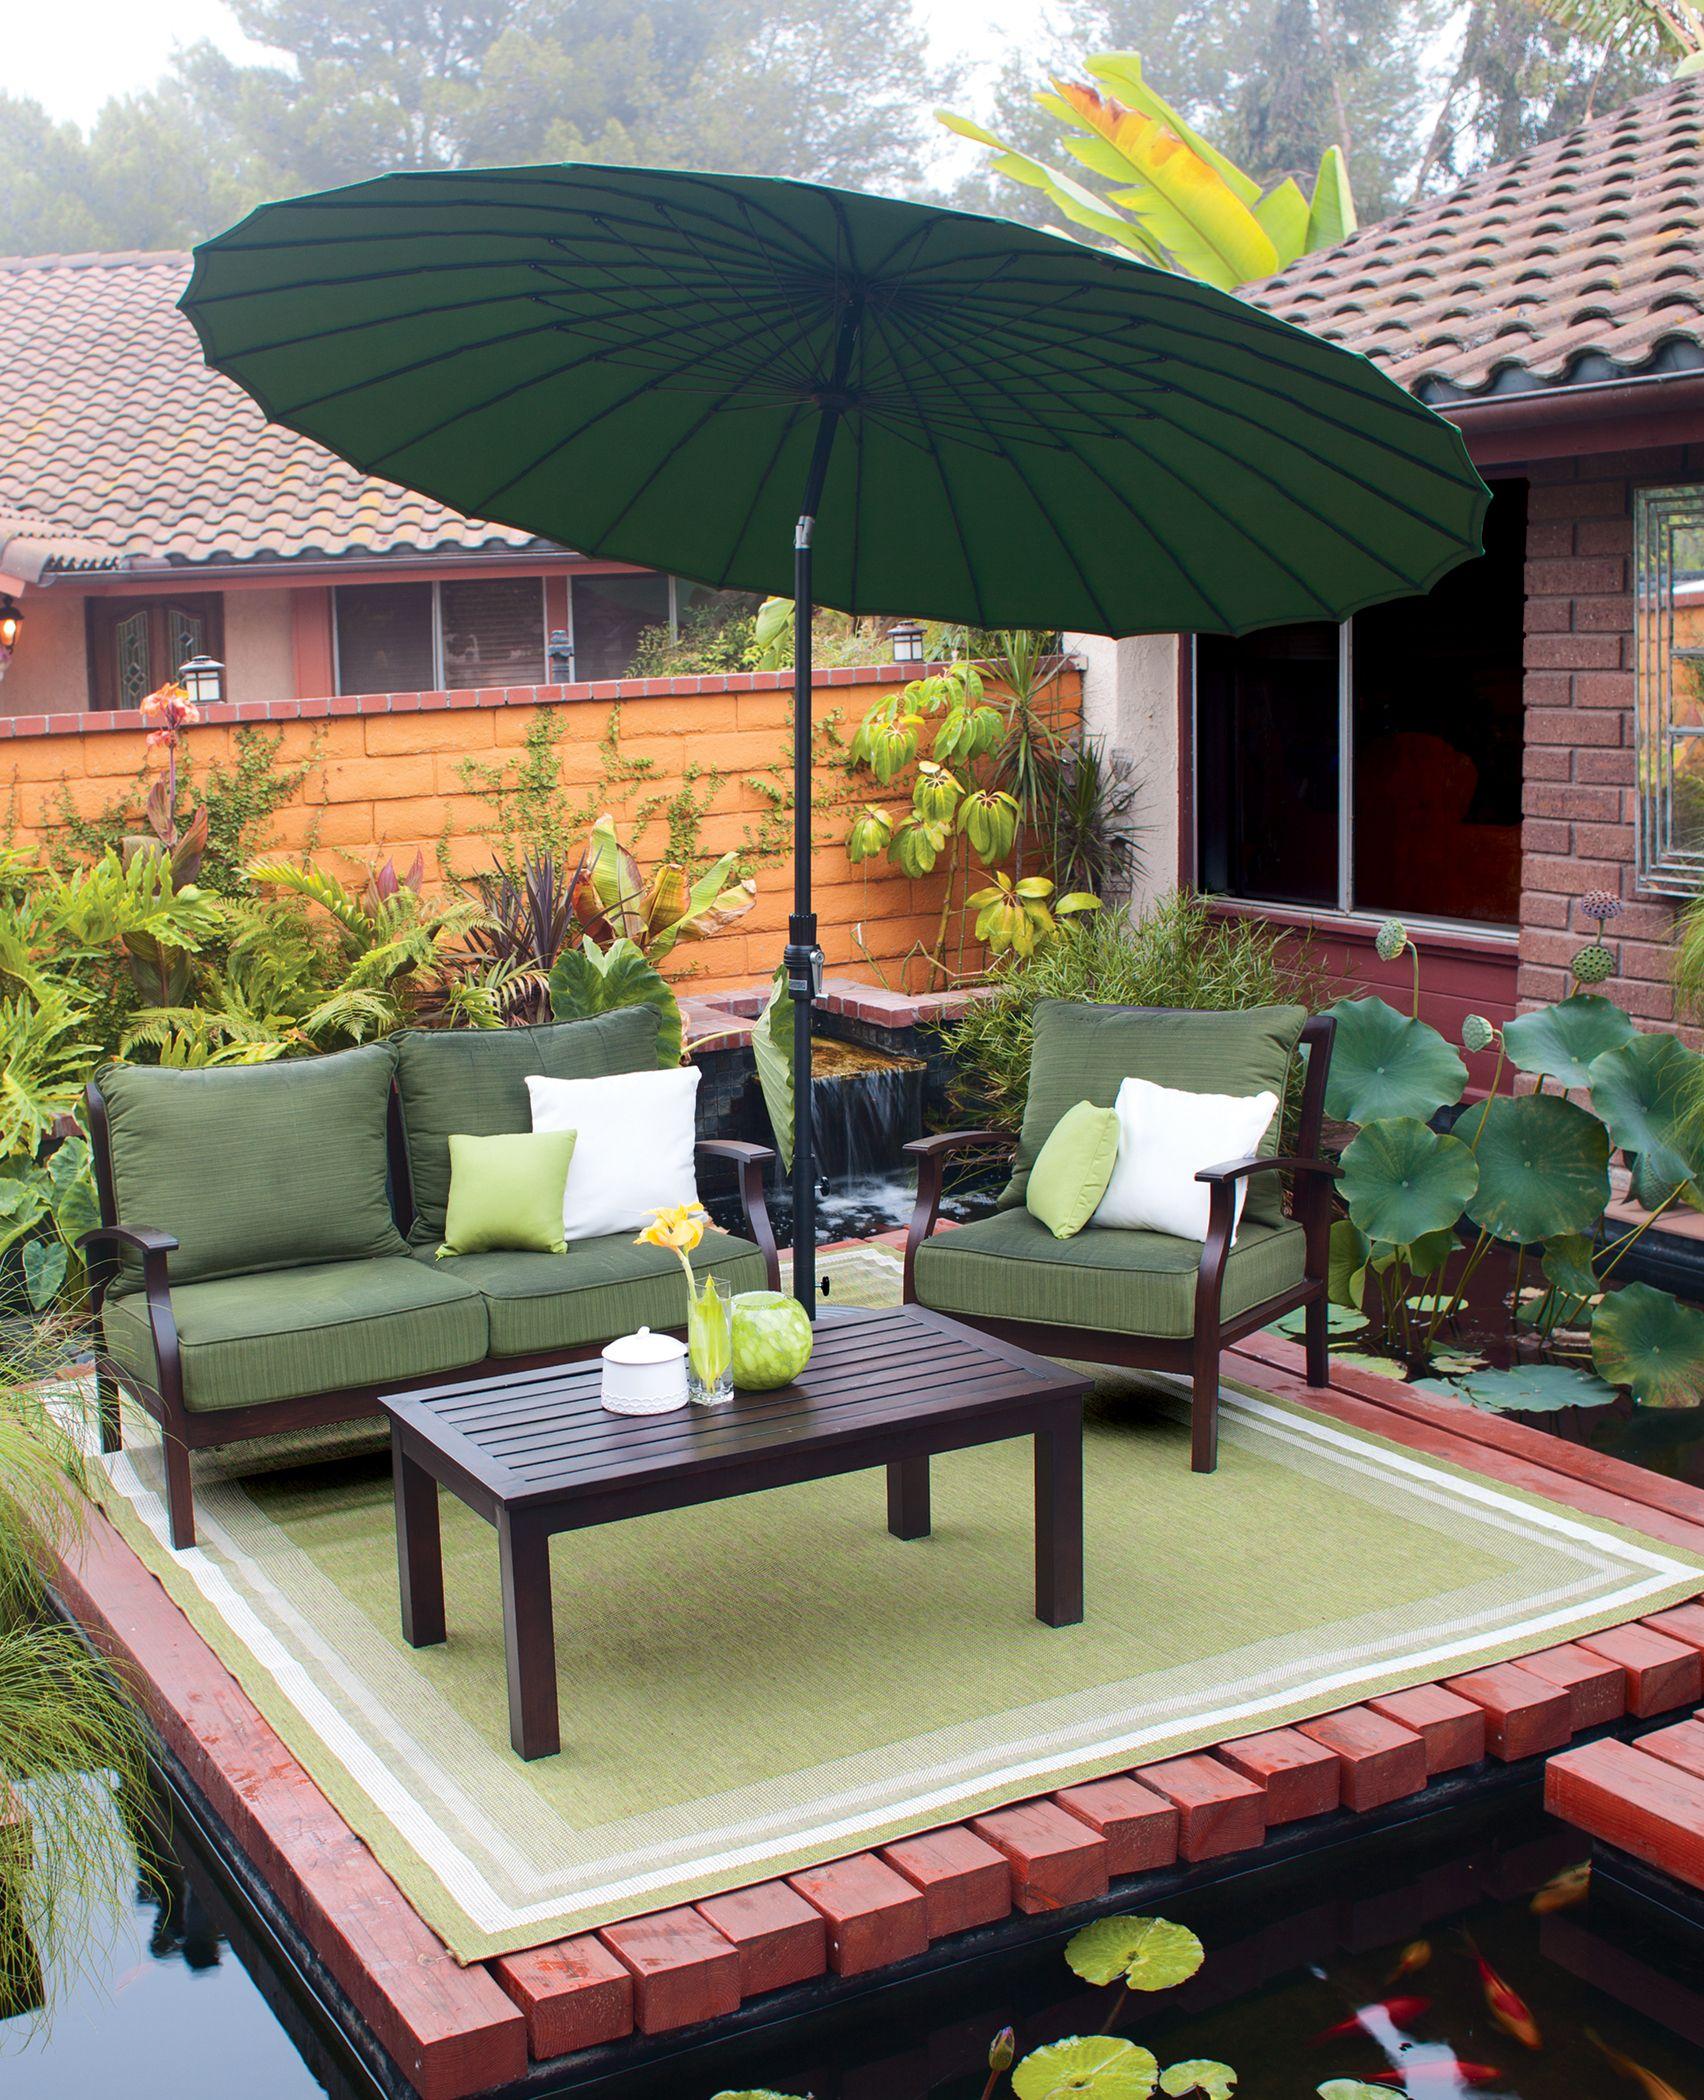 Good Treasure Garden 8u0027x10u0027 Garden Cottage   Lime Rug With A USA459 10u0027 Shanghai  Collar Tilt Umbrella